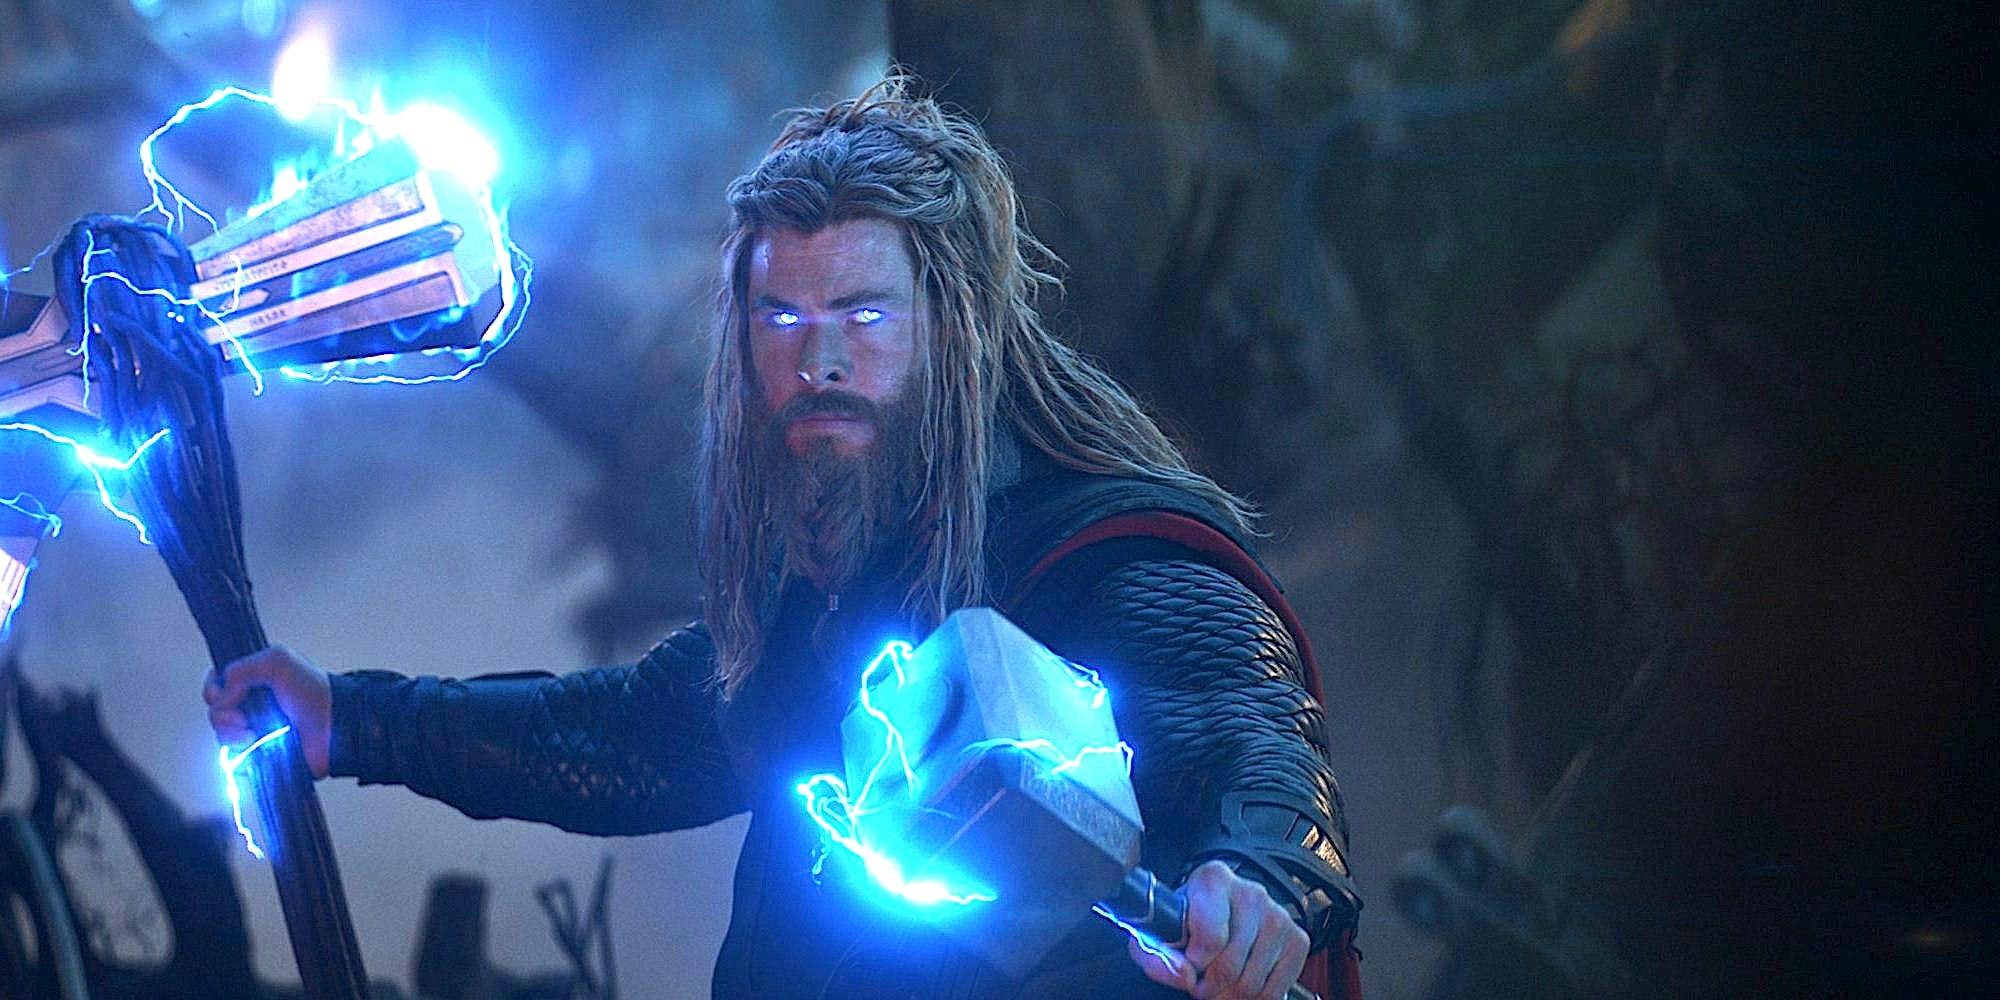 Thor, Avengers Endgame, BroThor